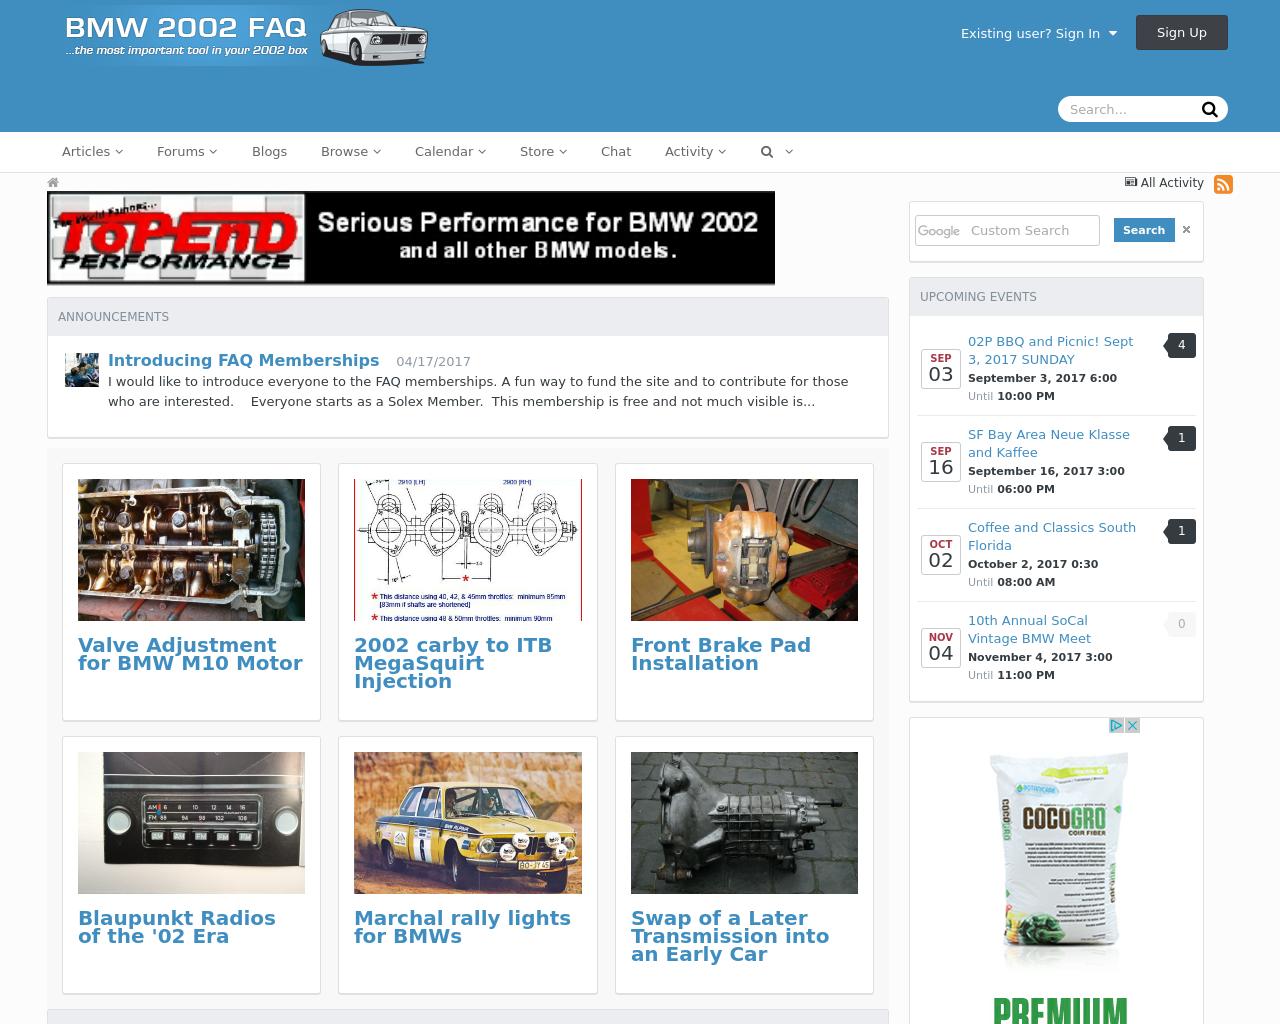 BMW-2002-FAQ-Advertising-Reviews-Pricing